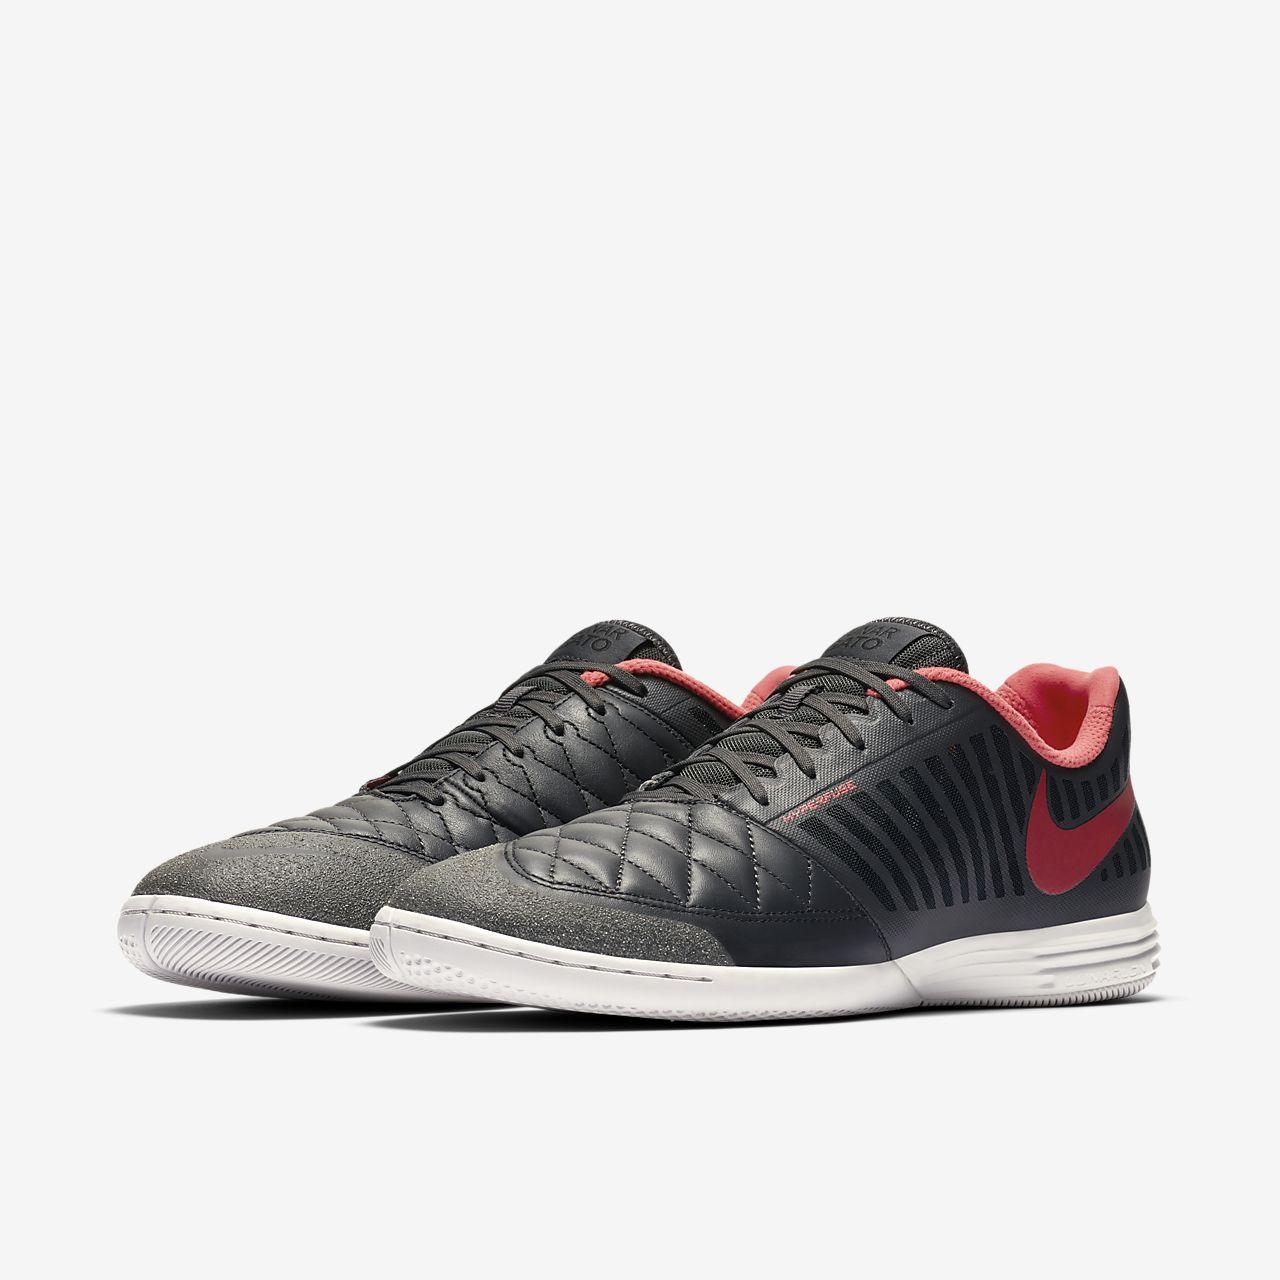 009c719de FC247 LunarGato II Soccer Shoe. Nike.com